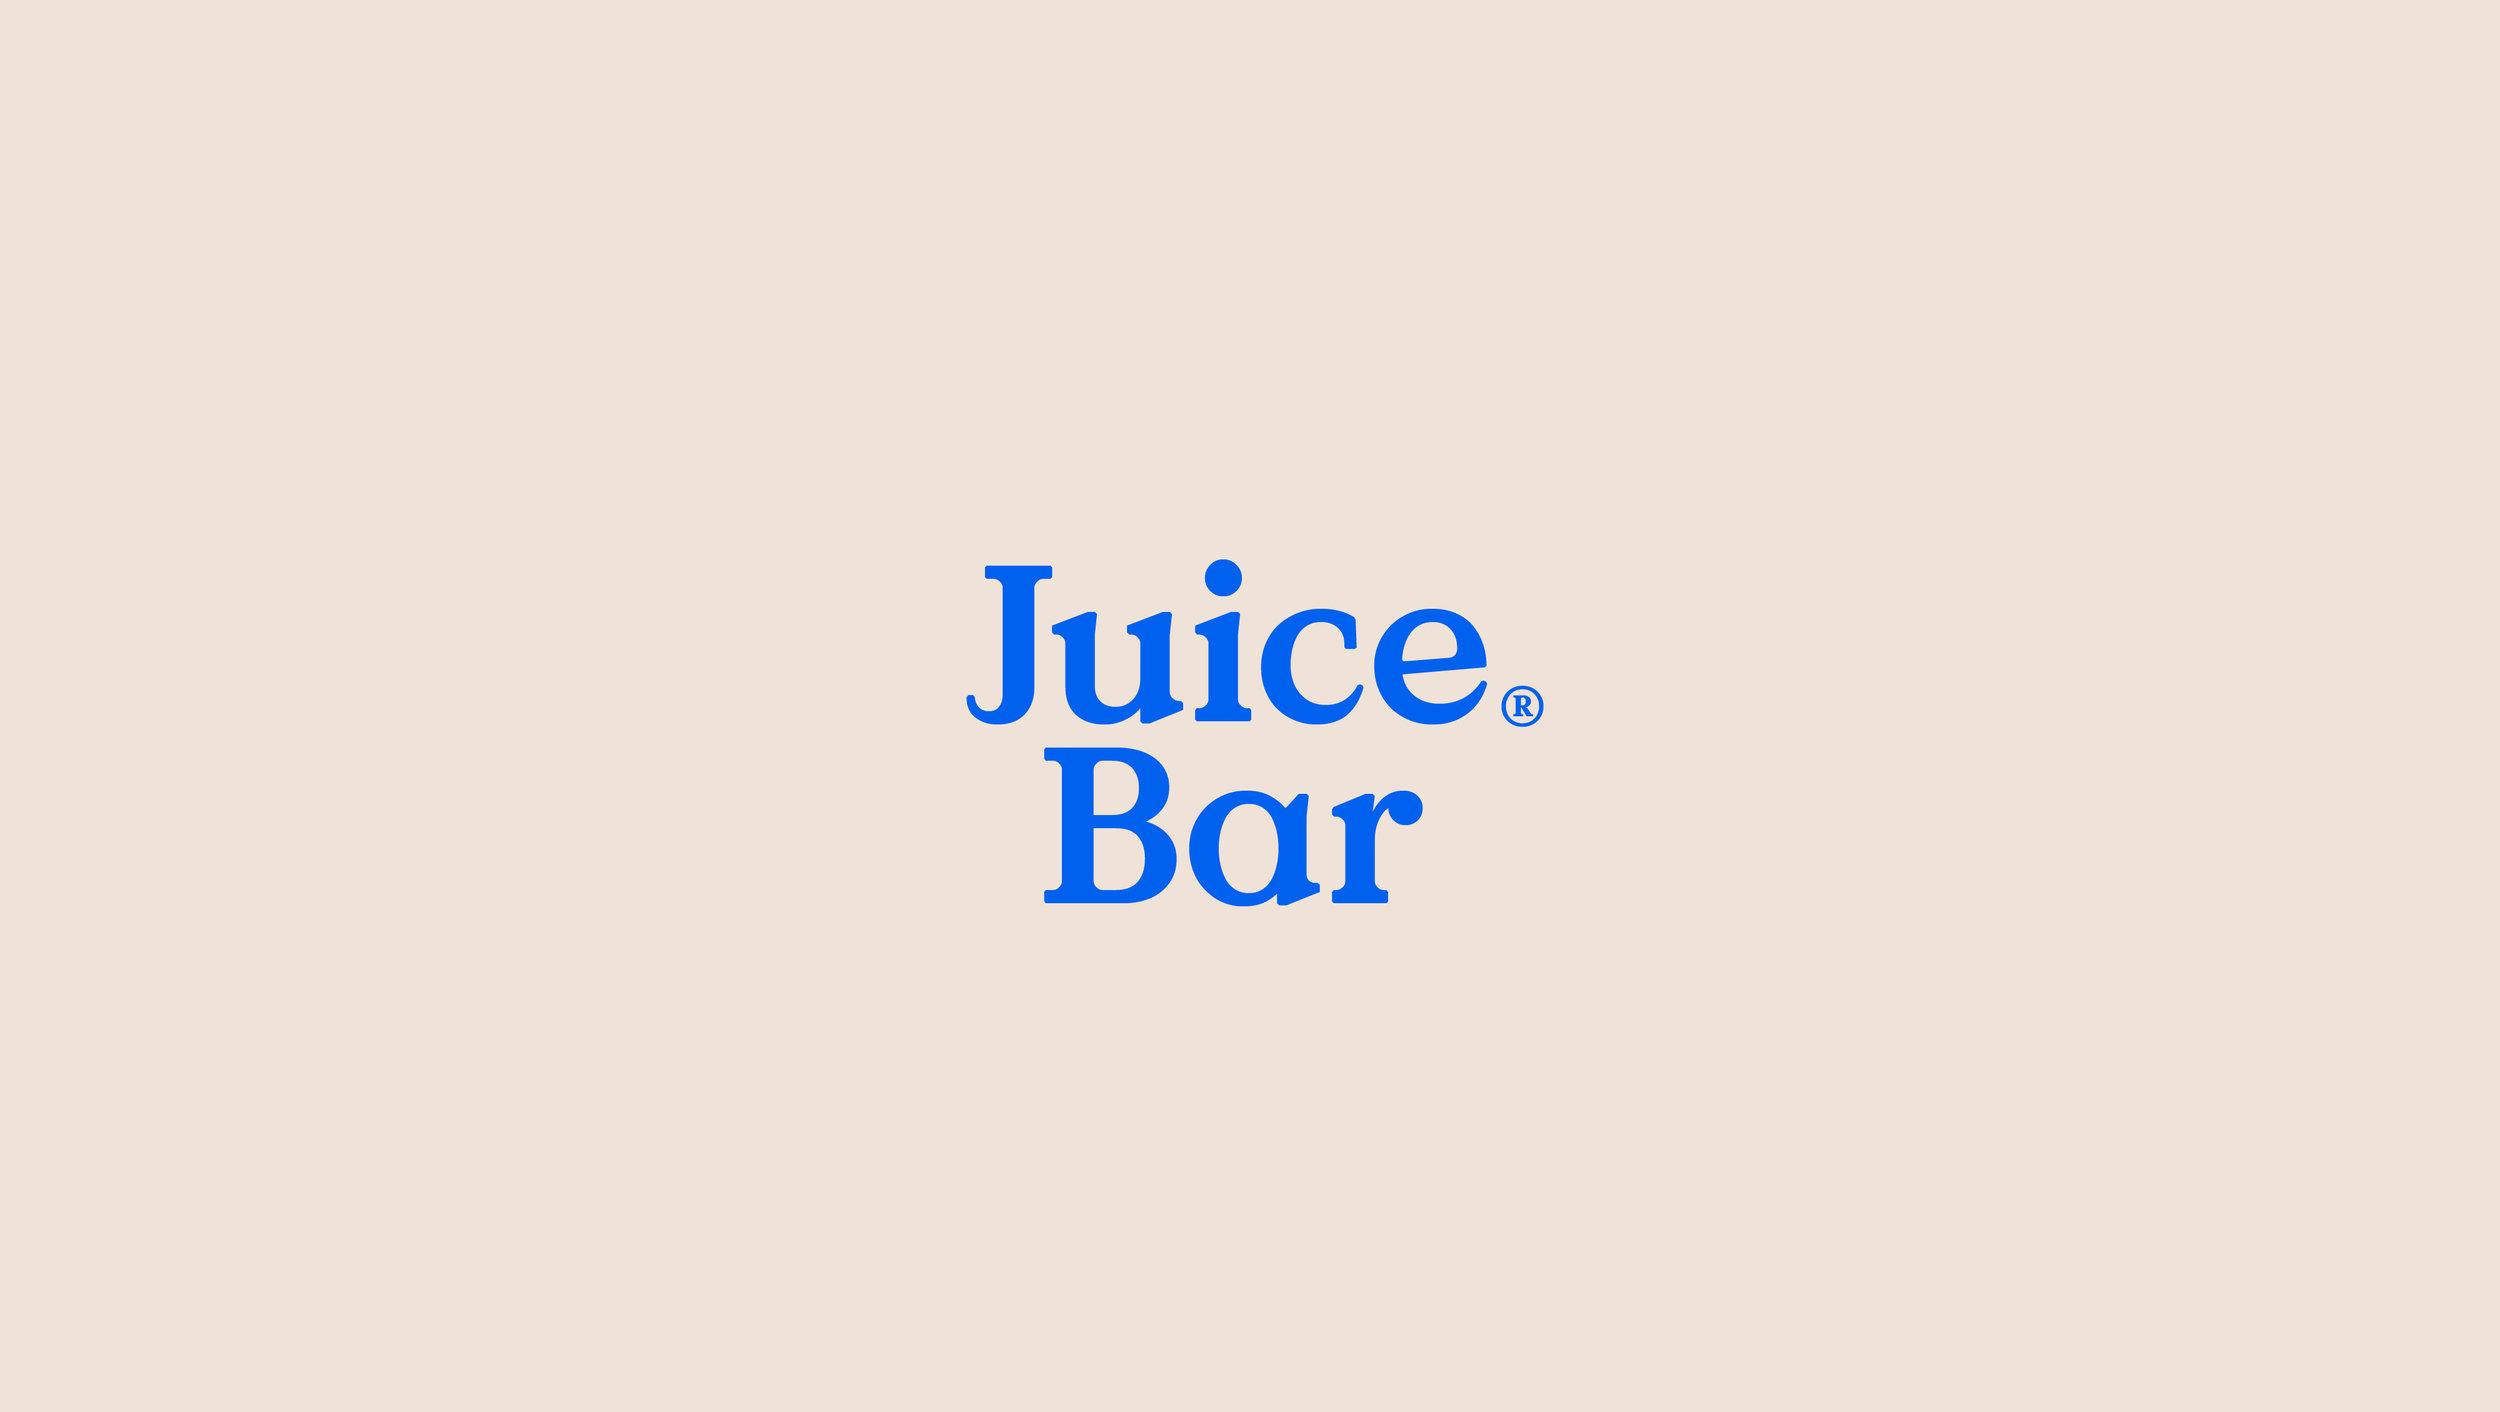 JuiceBoxBranding-01.jpg